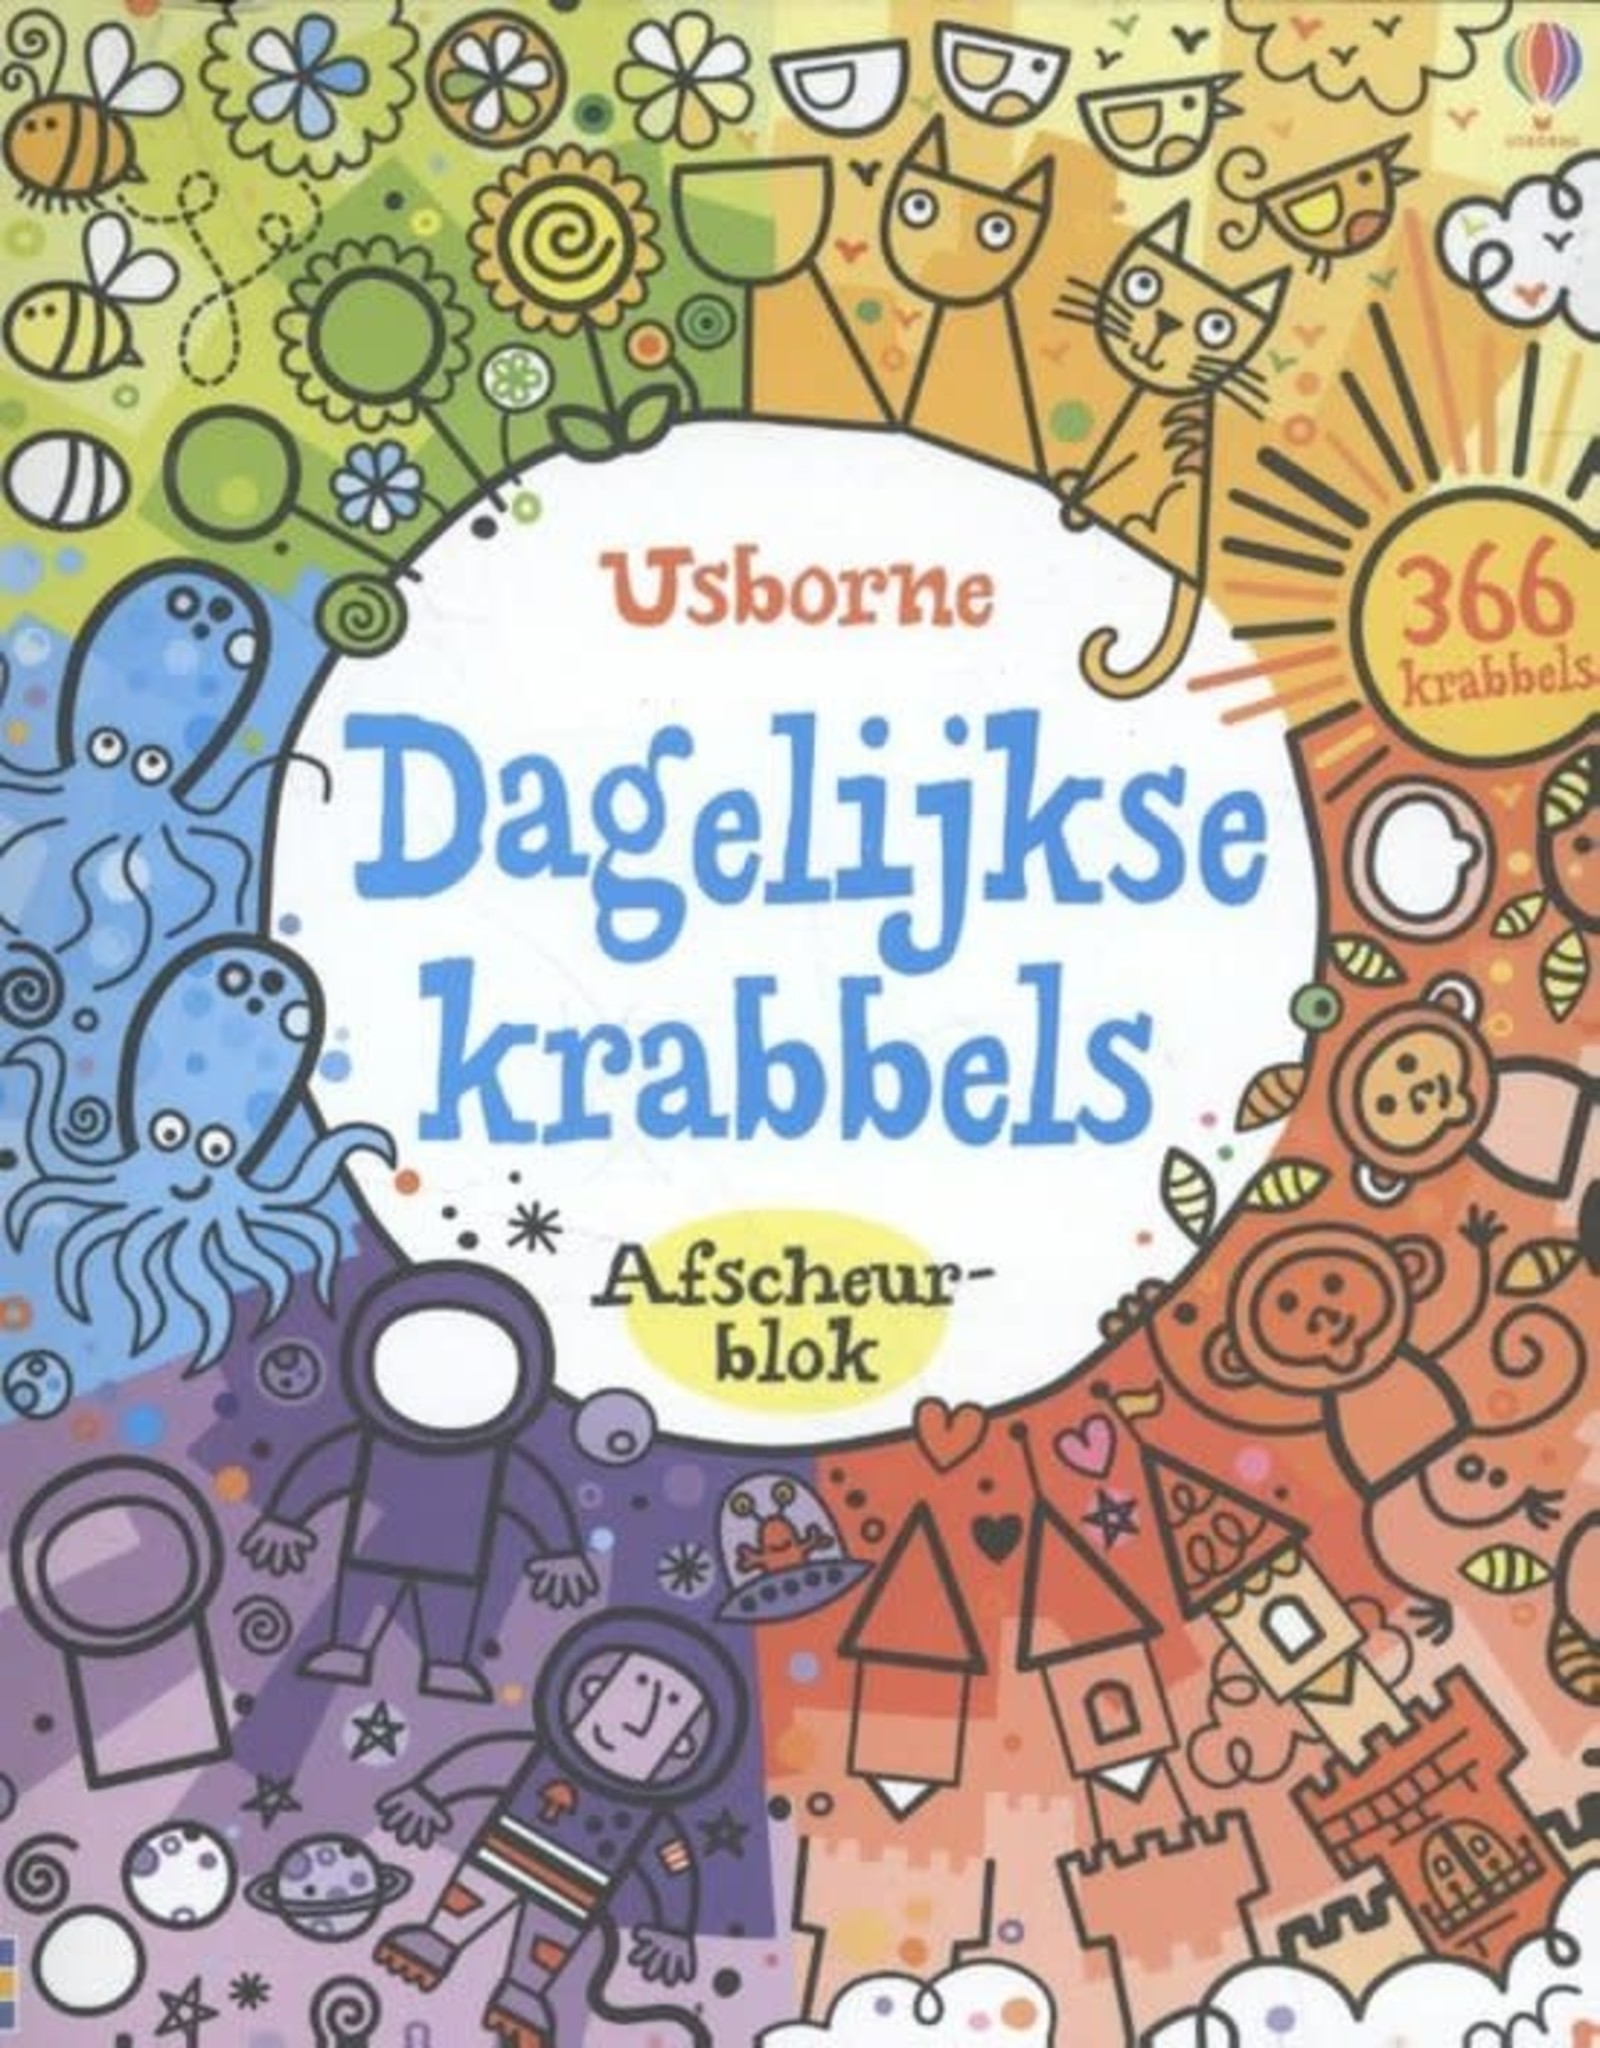 Dagelijkse Krabbels Afscheurblok